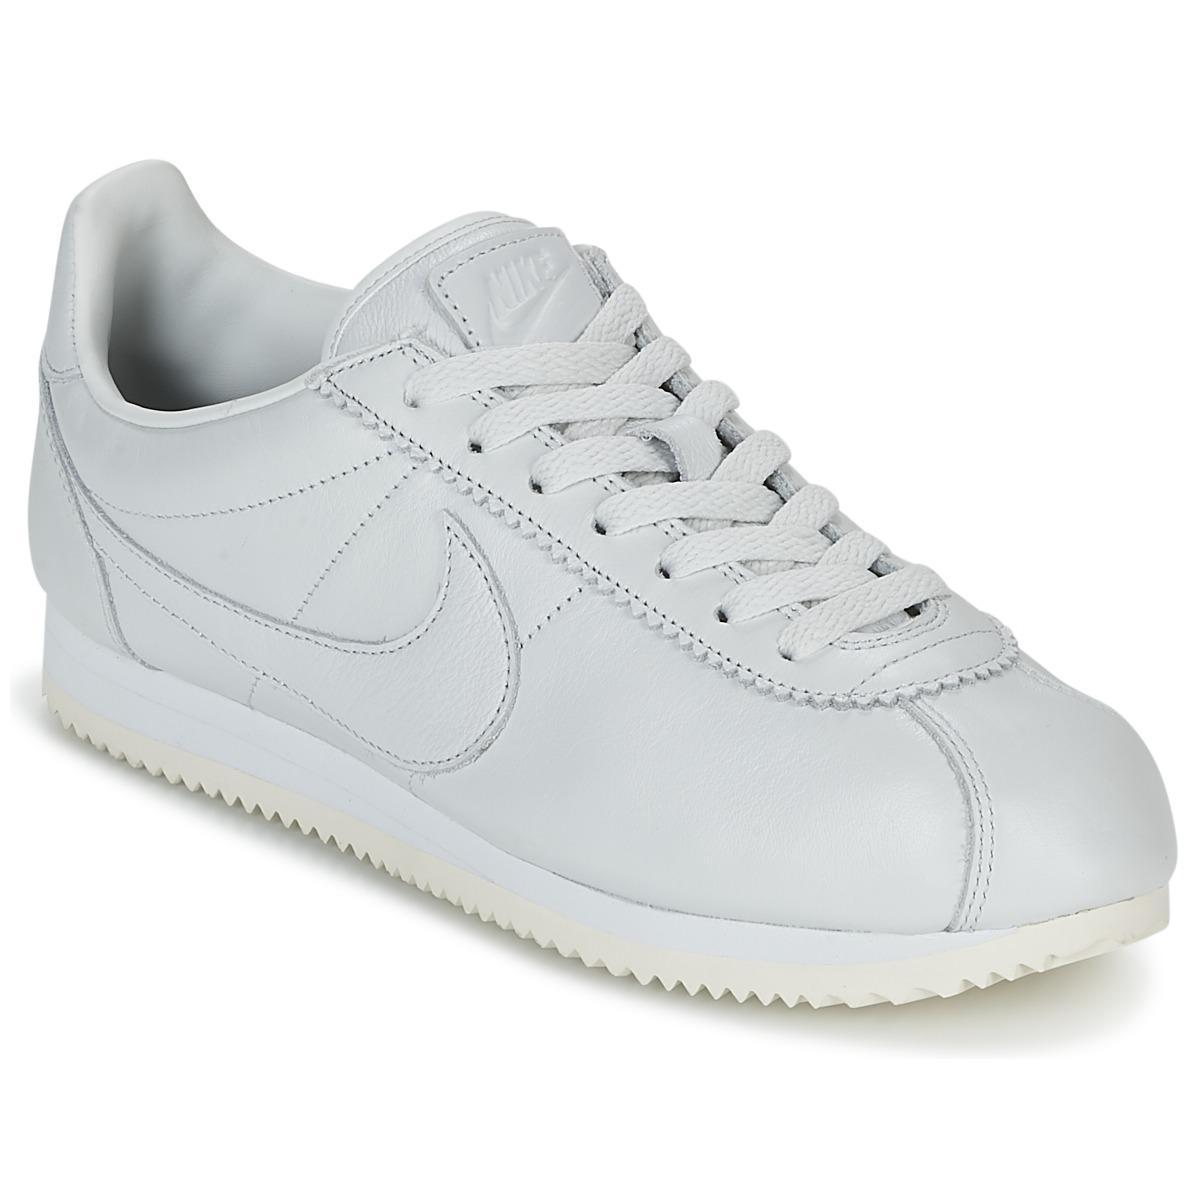 sale retailer a4906 77e3d Nike. Classic Cortez Premium Men s Shoes (trainers) In White